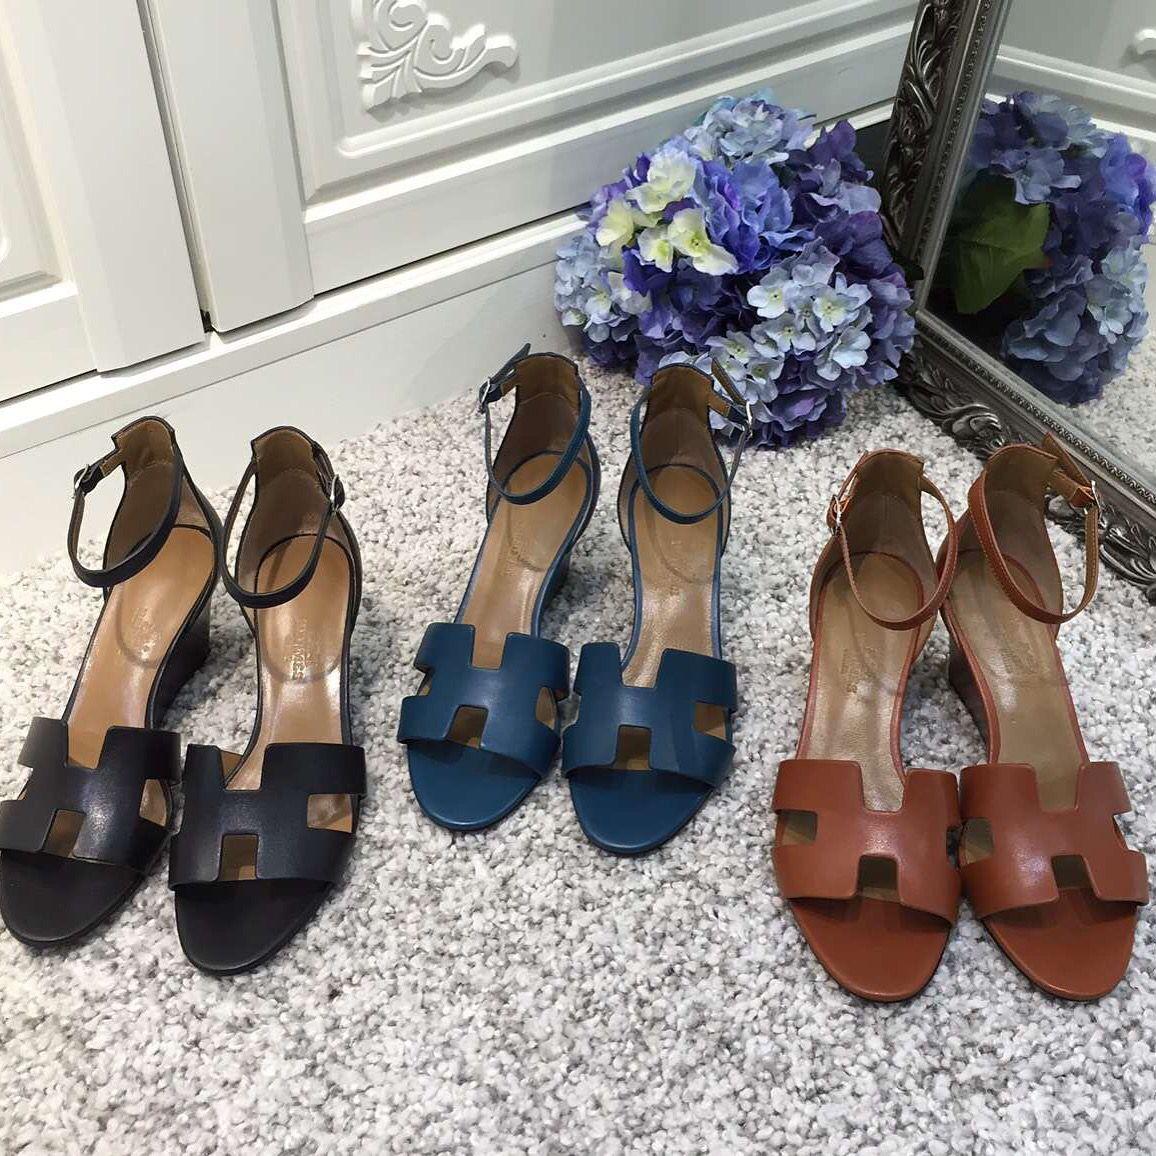 Hermes sandals dance shoes - Hermes Sandals Replica